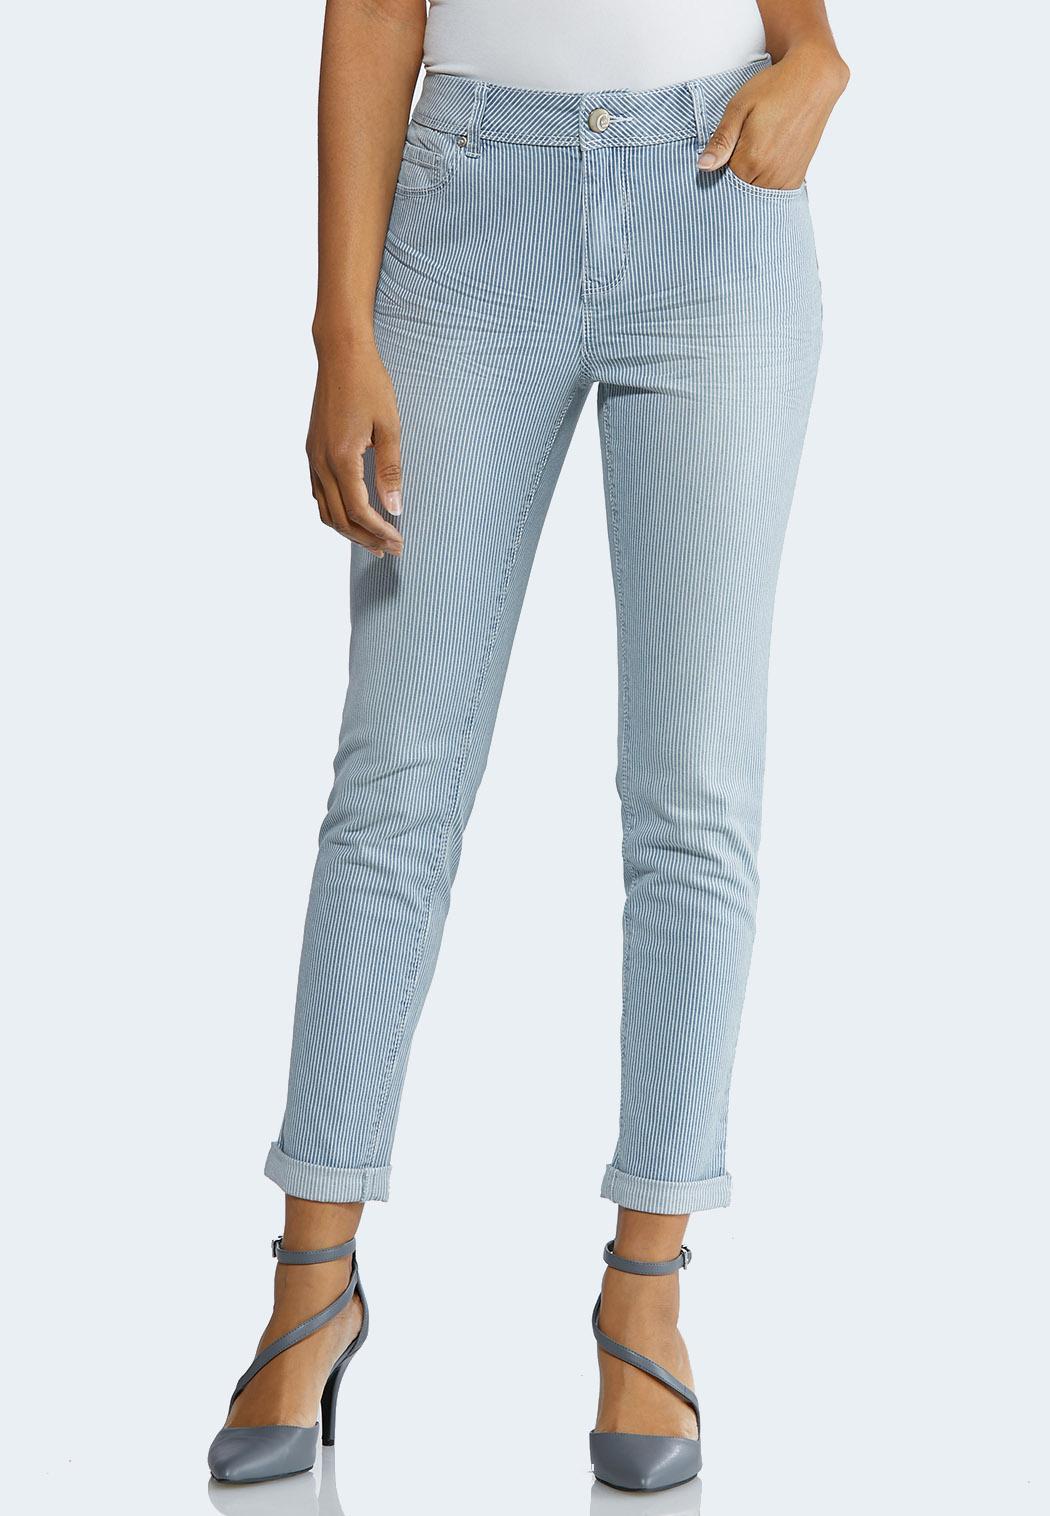 1154ffdee8 Petite Striped Ankle Jeans alternate view Petite Striped Ankle Jeans